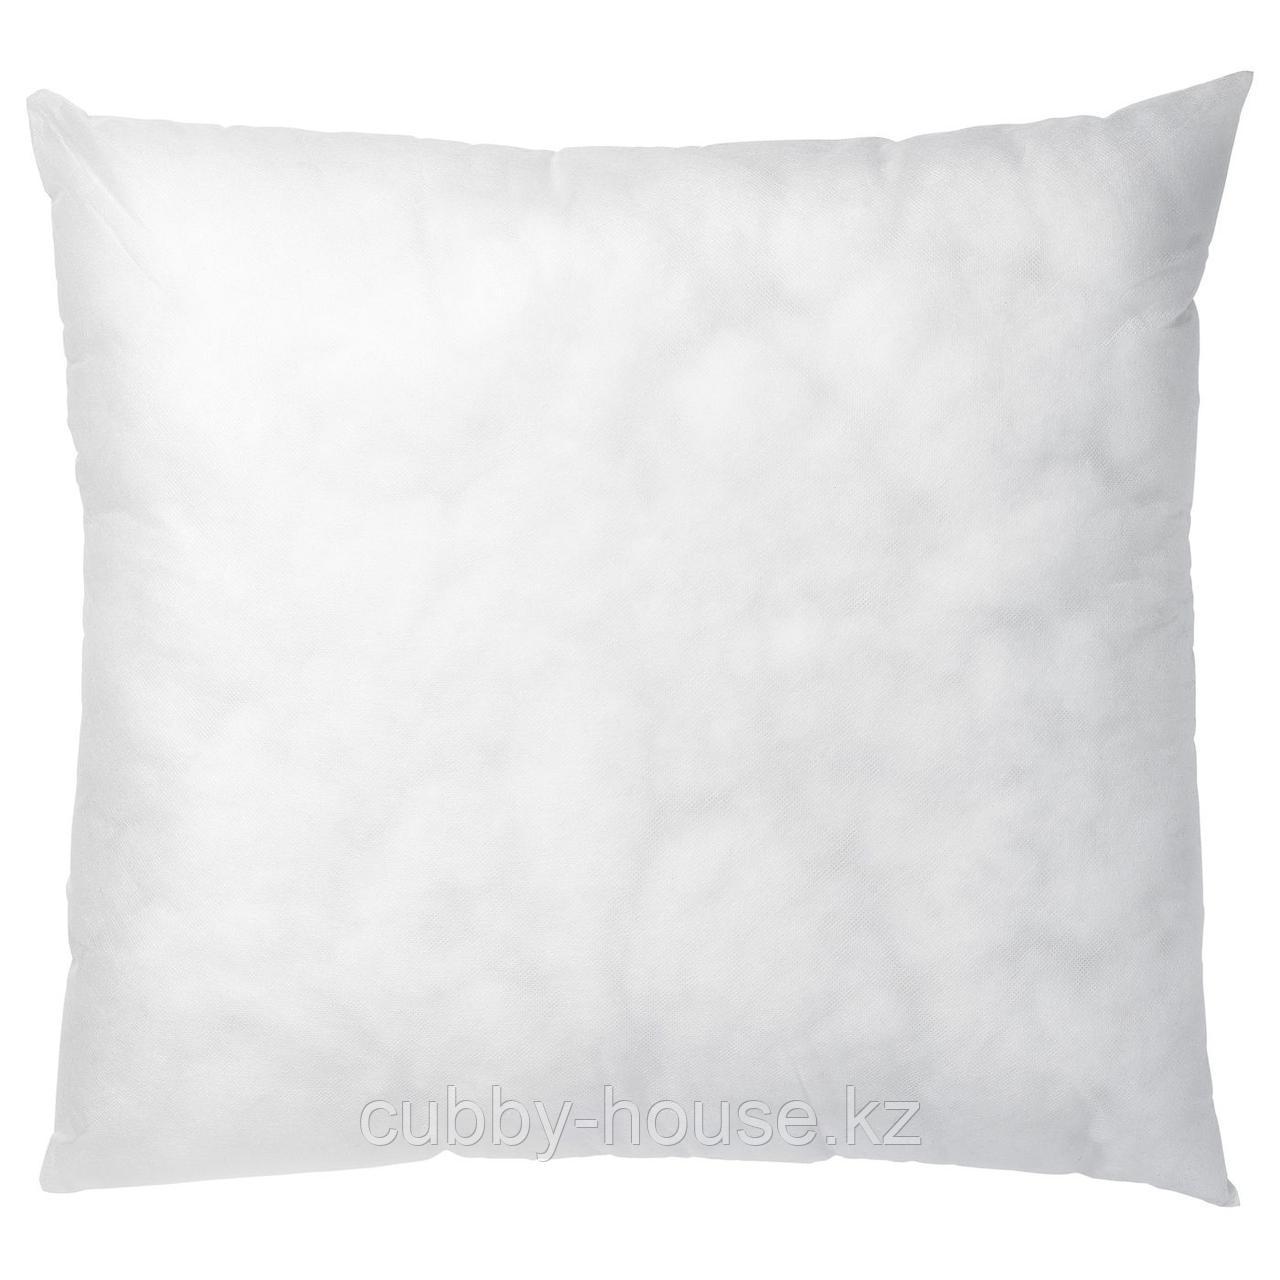 ИННЕР Подушка, белый, 50x50 см